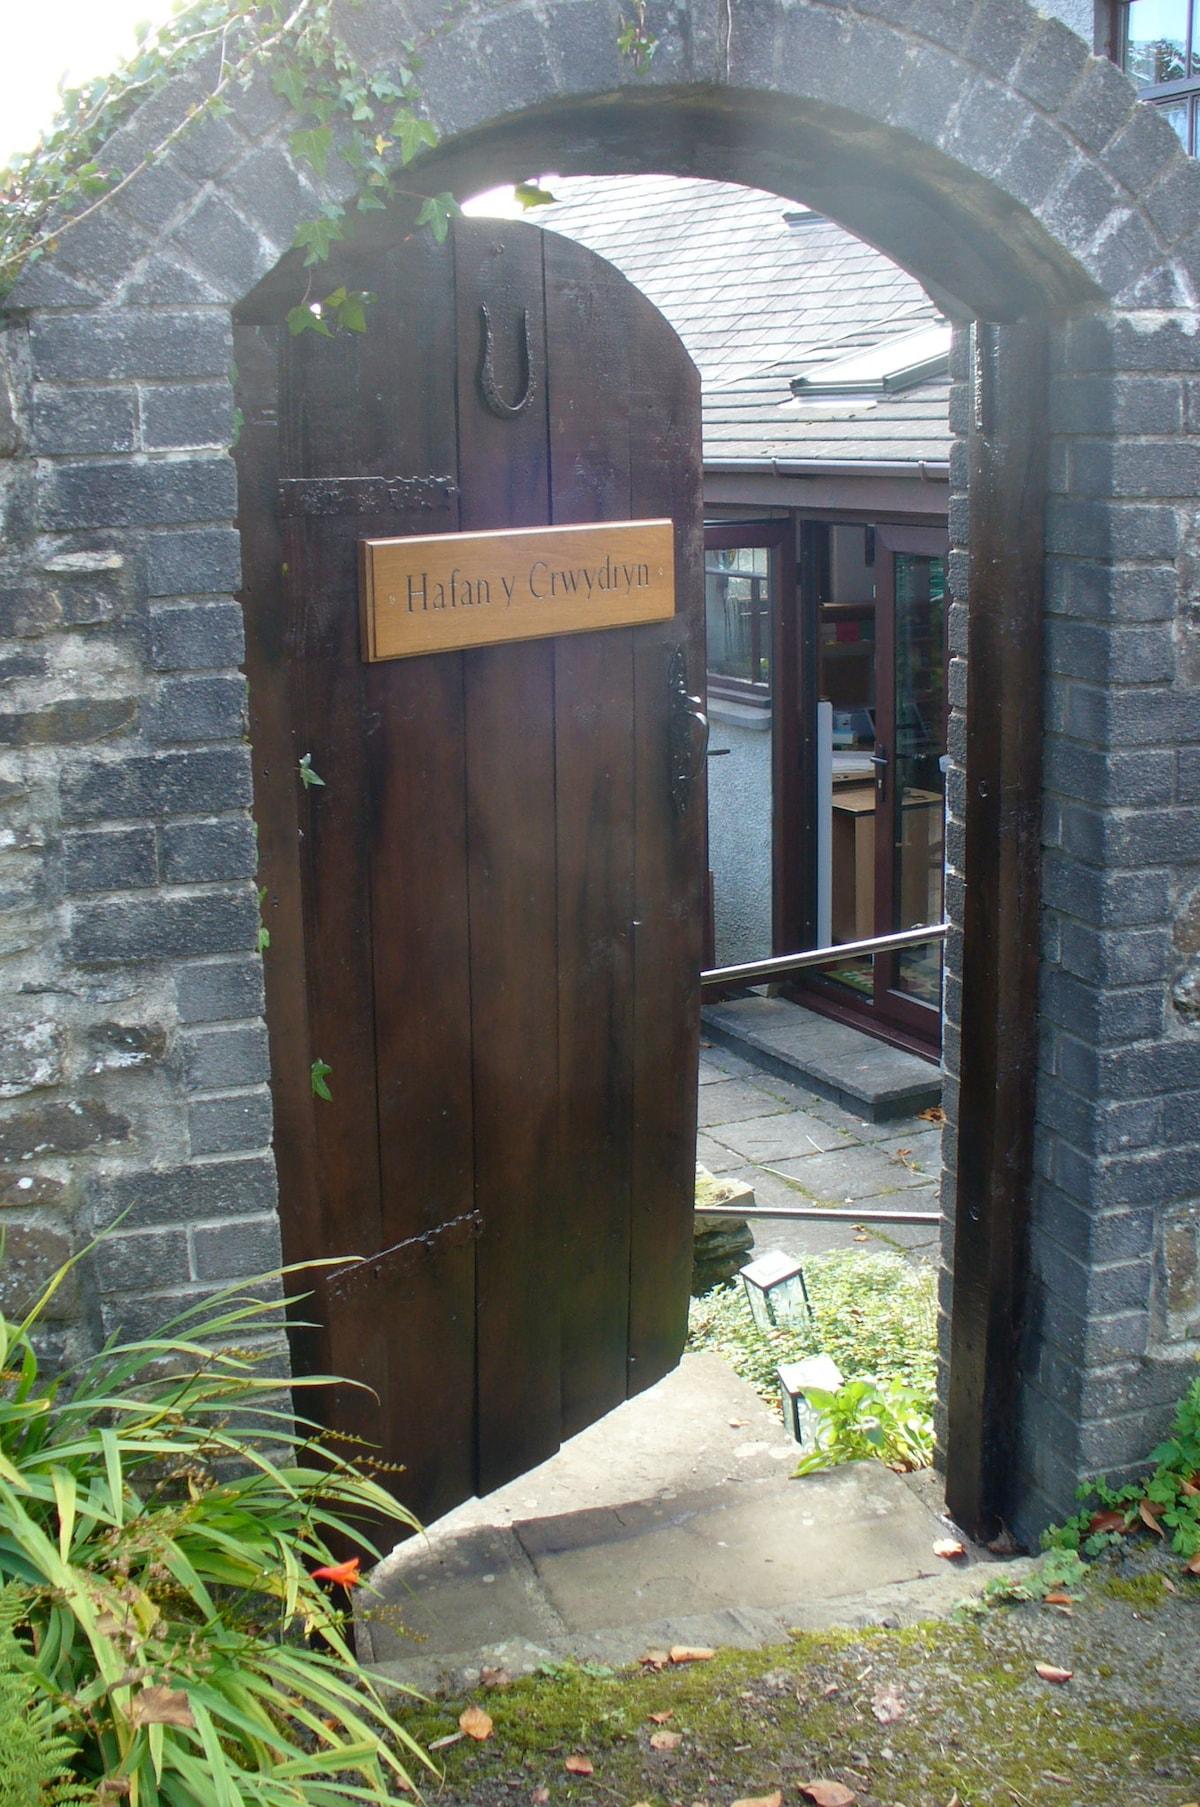 Hafan Y Crwydryn (Ha-van uh croo-uh-drin) means Nomad's Rest in Welsh